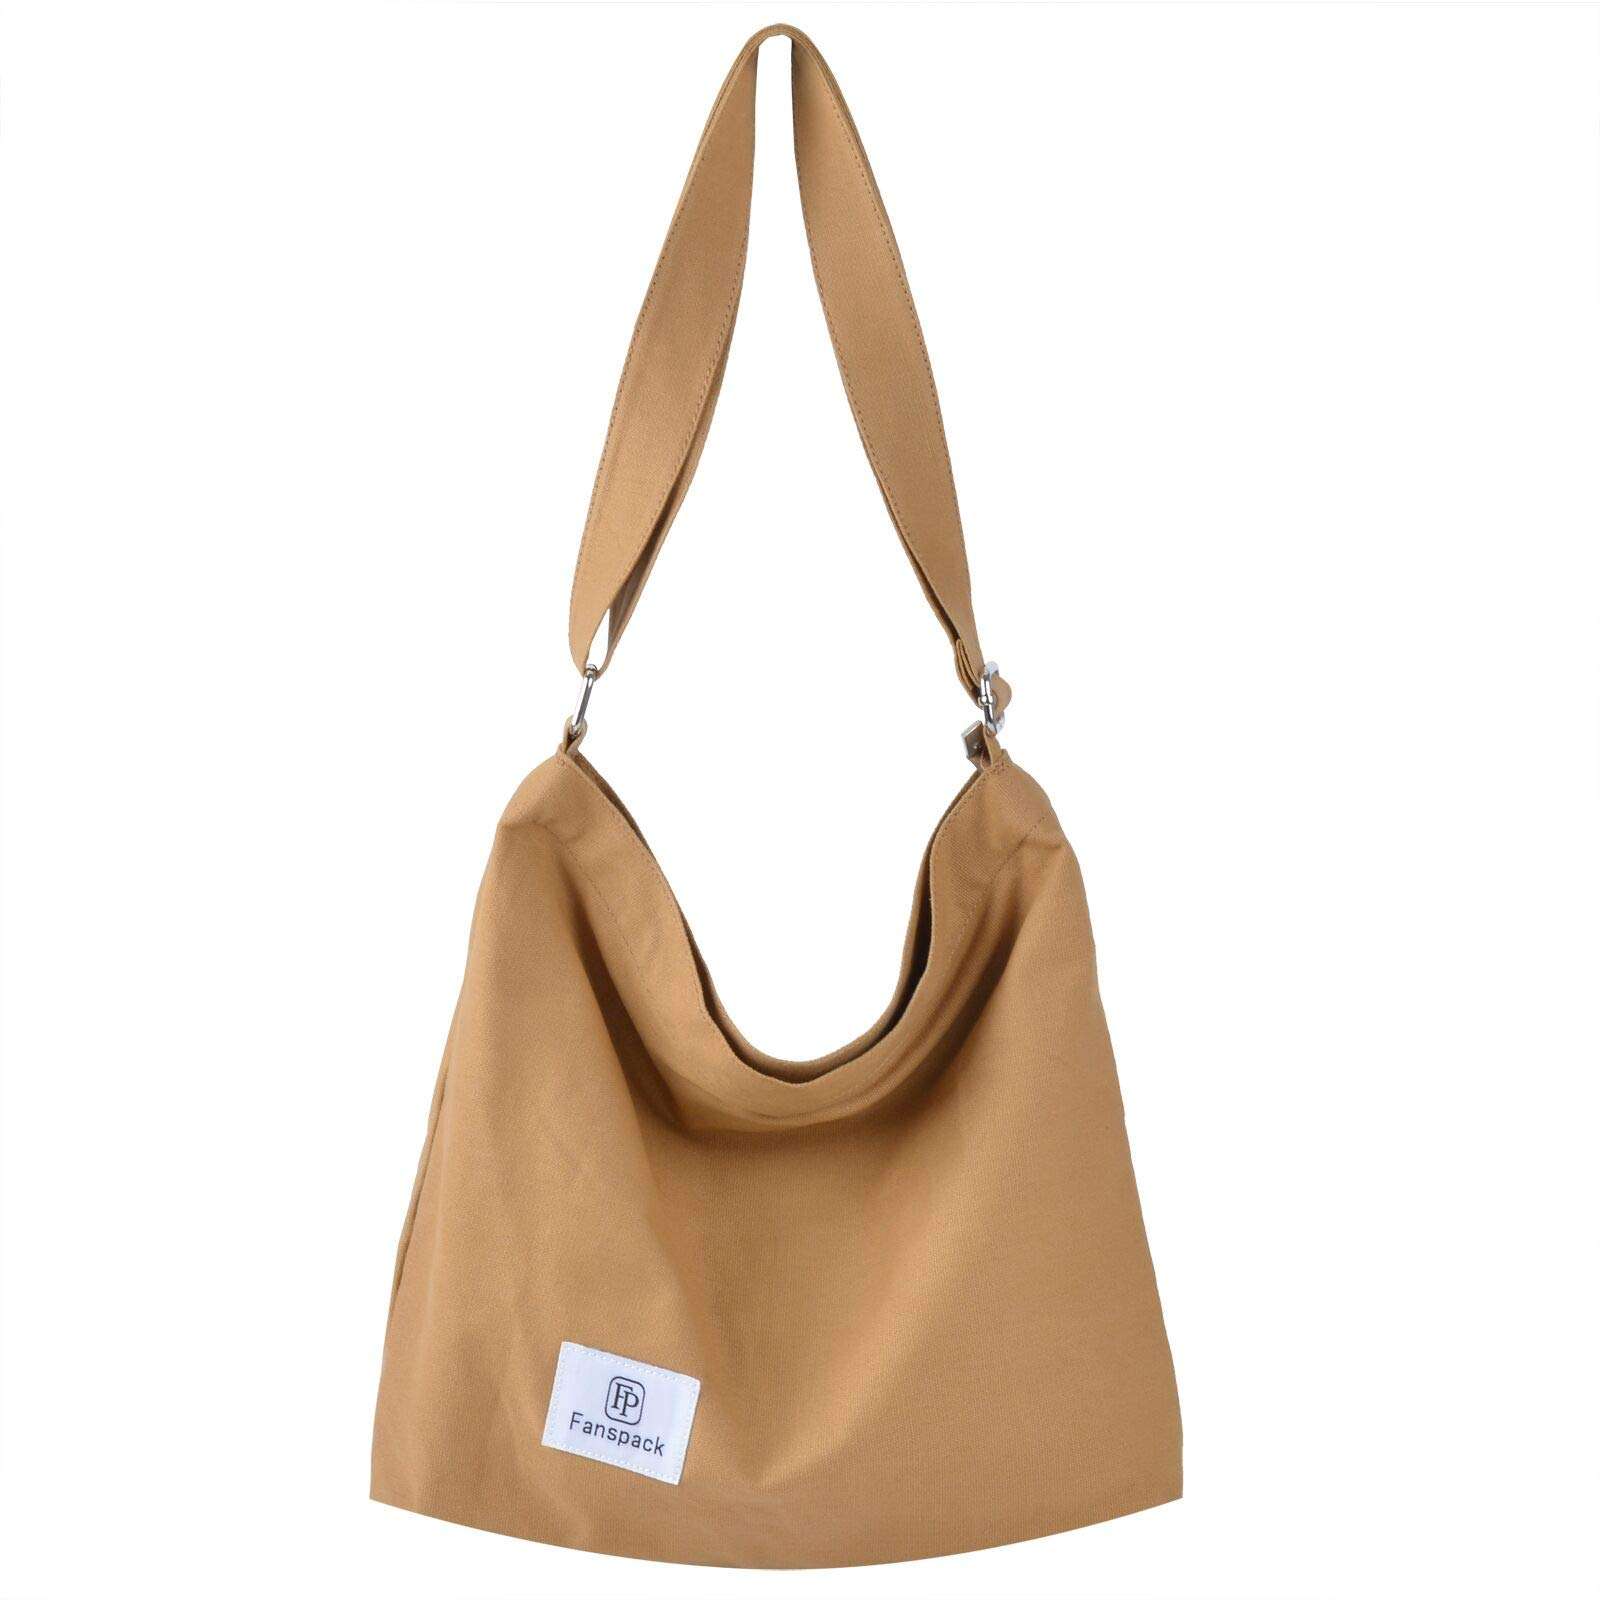 Fanspack Women's Canvas Hobo Handbags Casual Hobo Tote Bag Crossbody Bags Shoulder Bag Shopping Work Bag